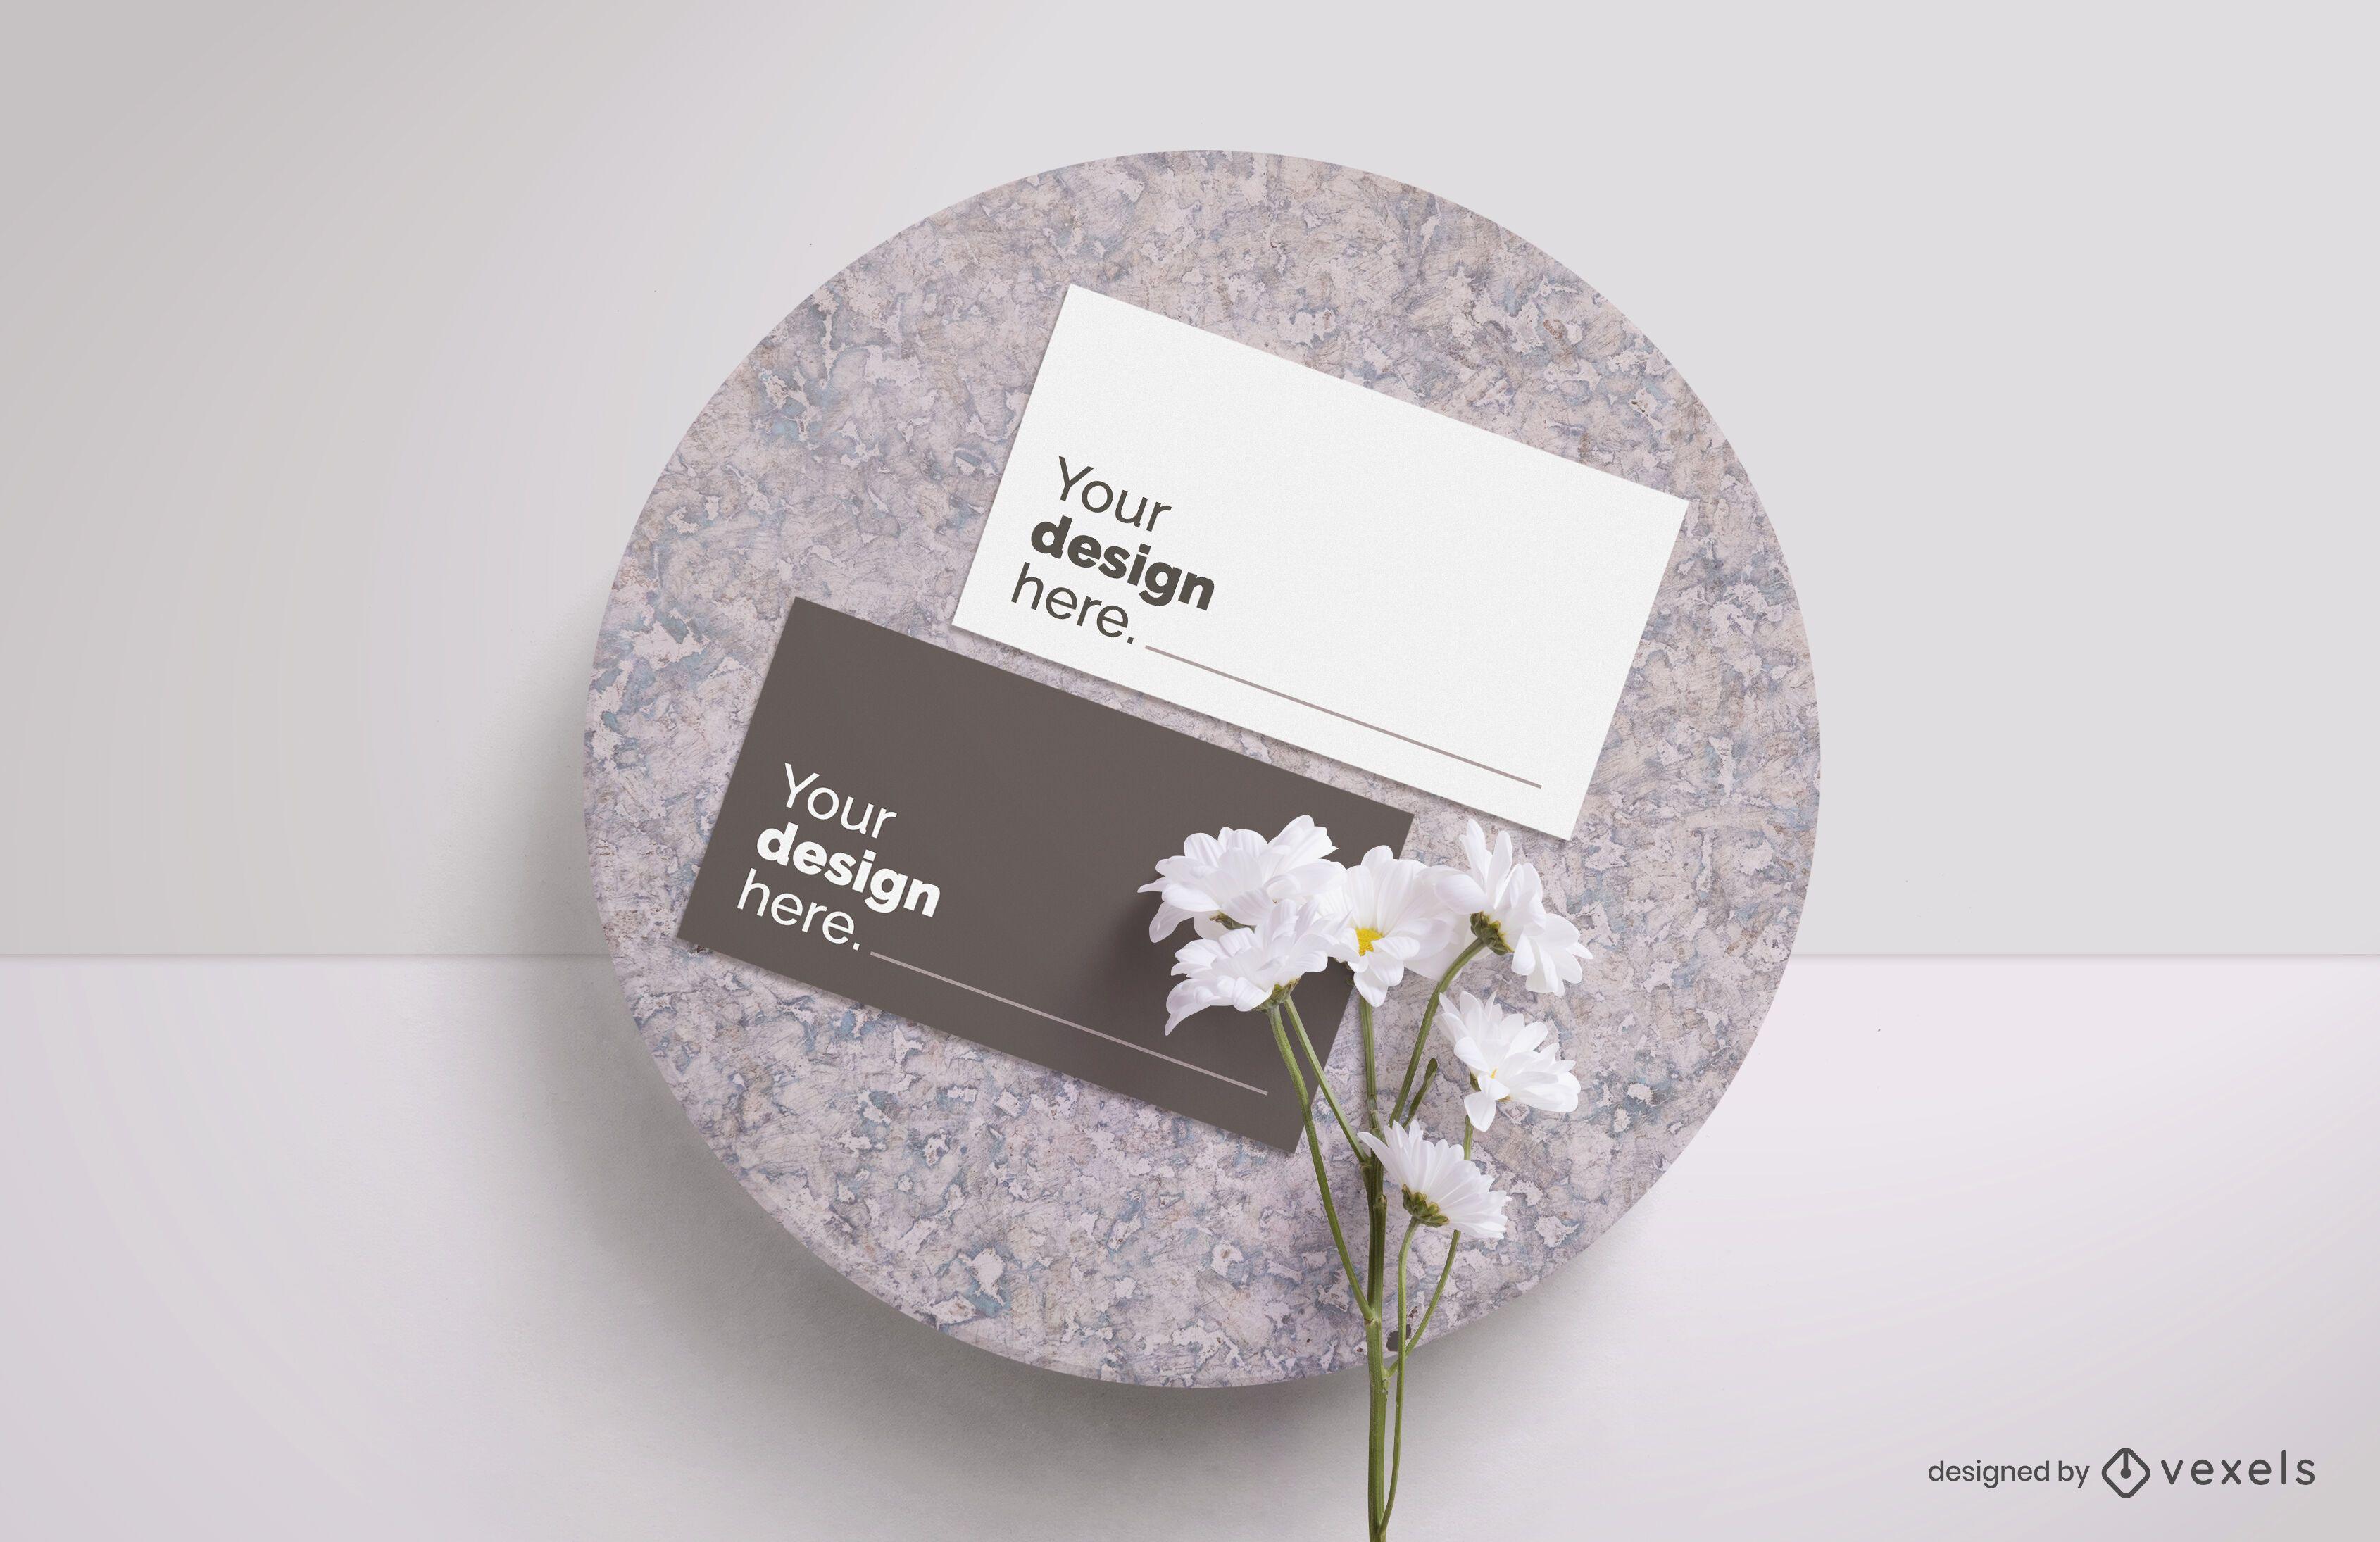 Composici?n de maqueta de flor de tarjeta de visita